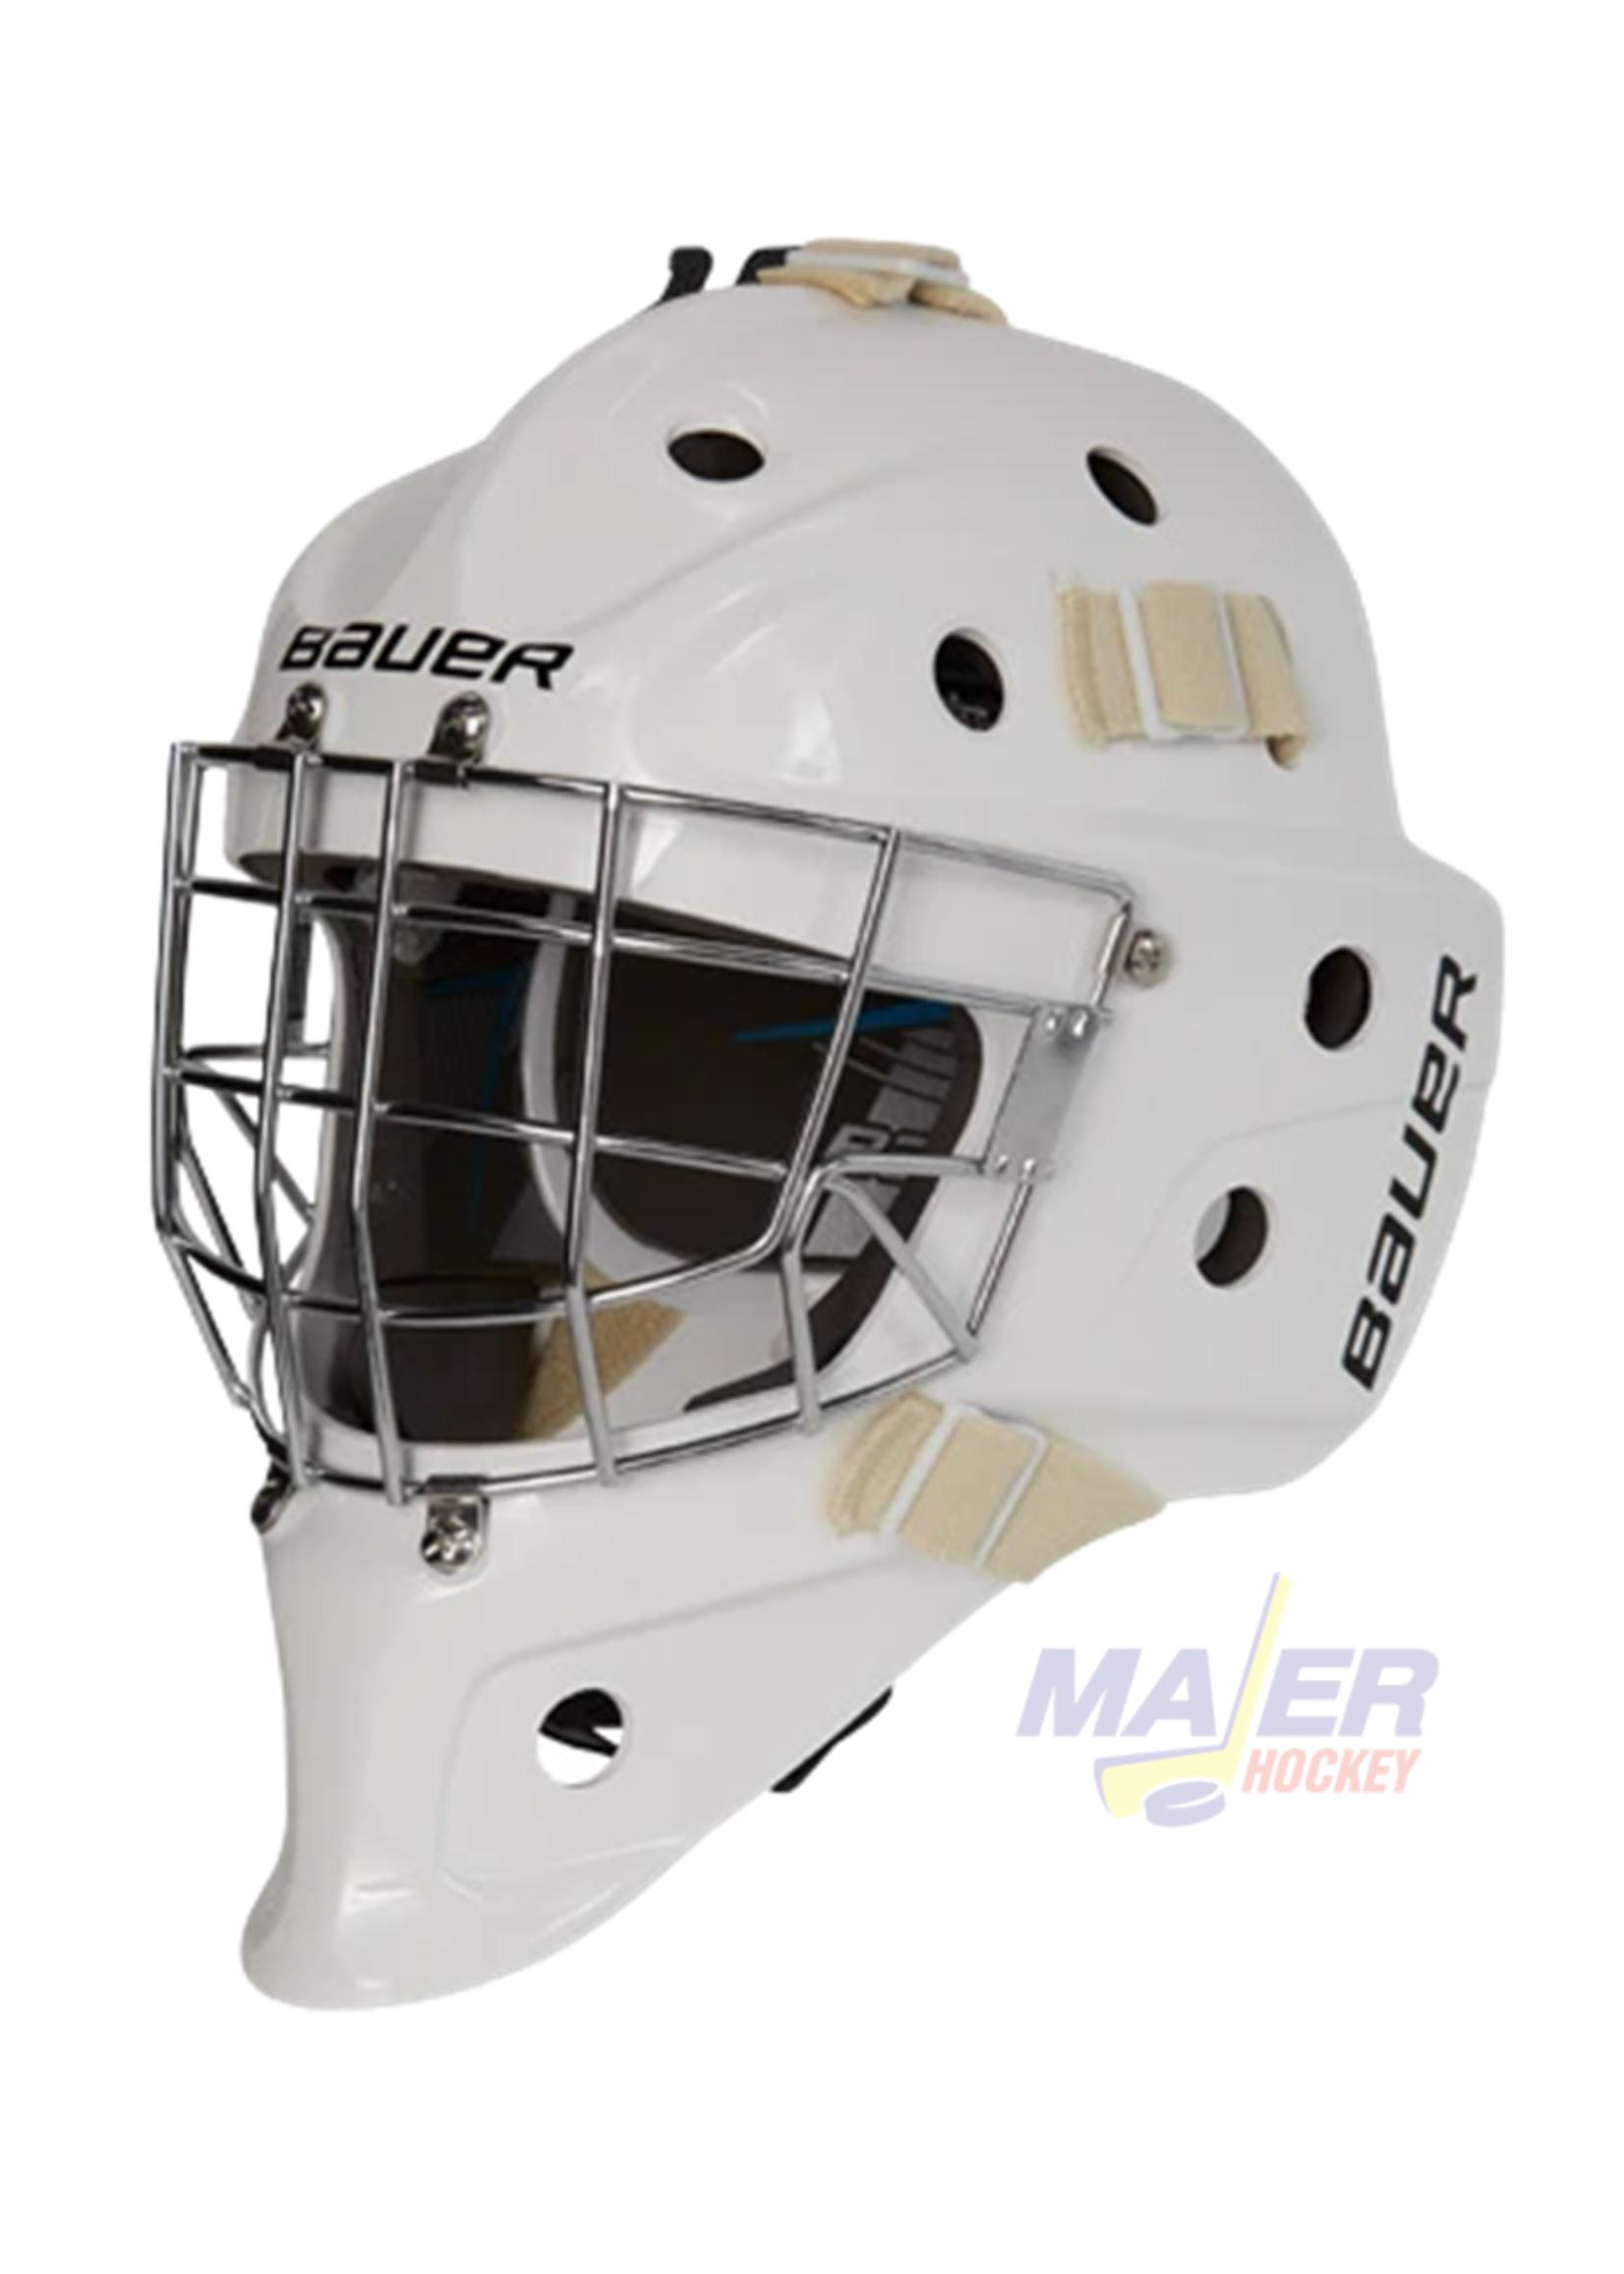 Bauer 930 Youth Goalie Mask